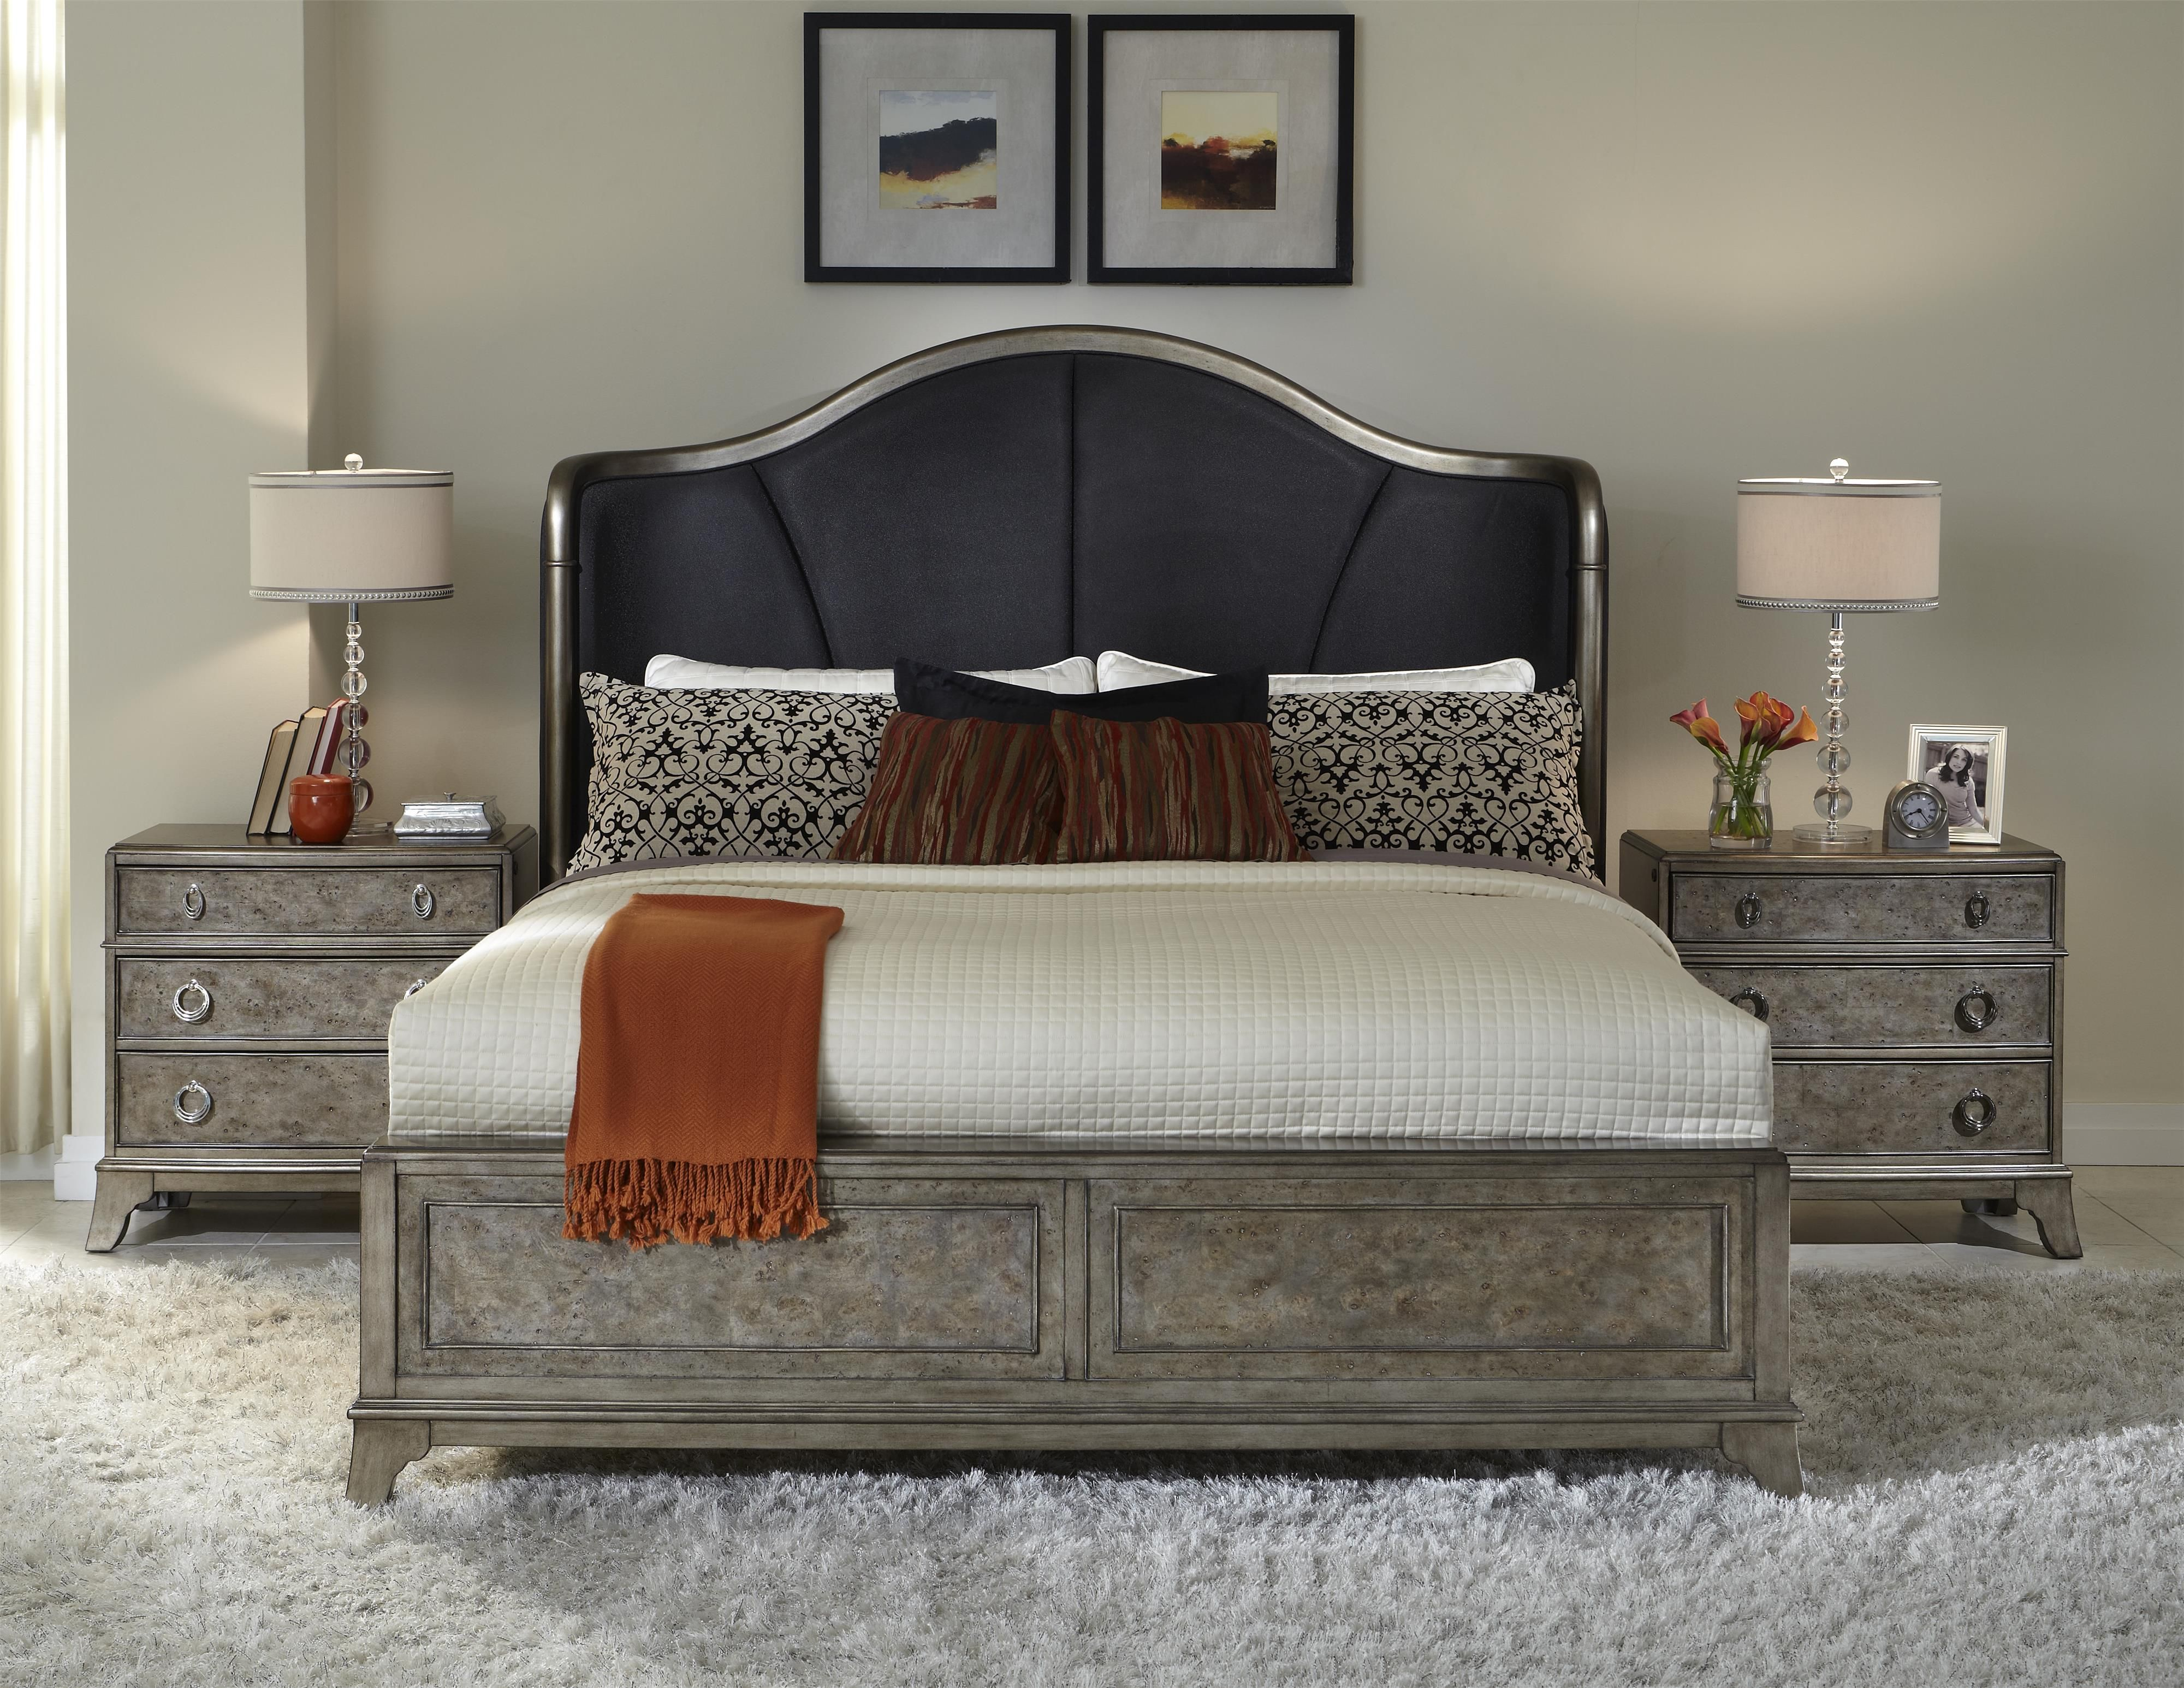 Pulaski Furniture Bedroom Sets Hanson Cal King Bedroom Group By Pulaski Furniture My Bed